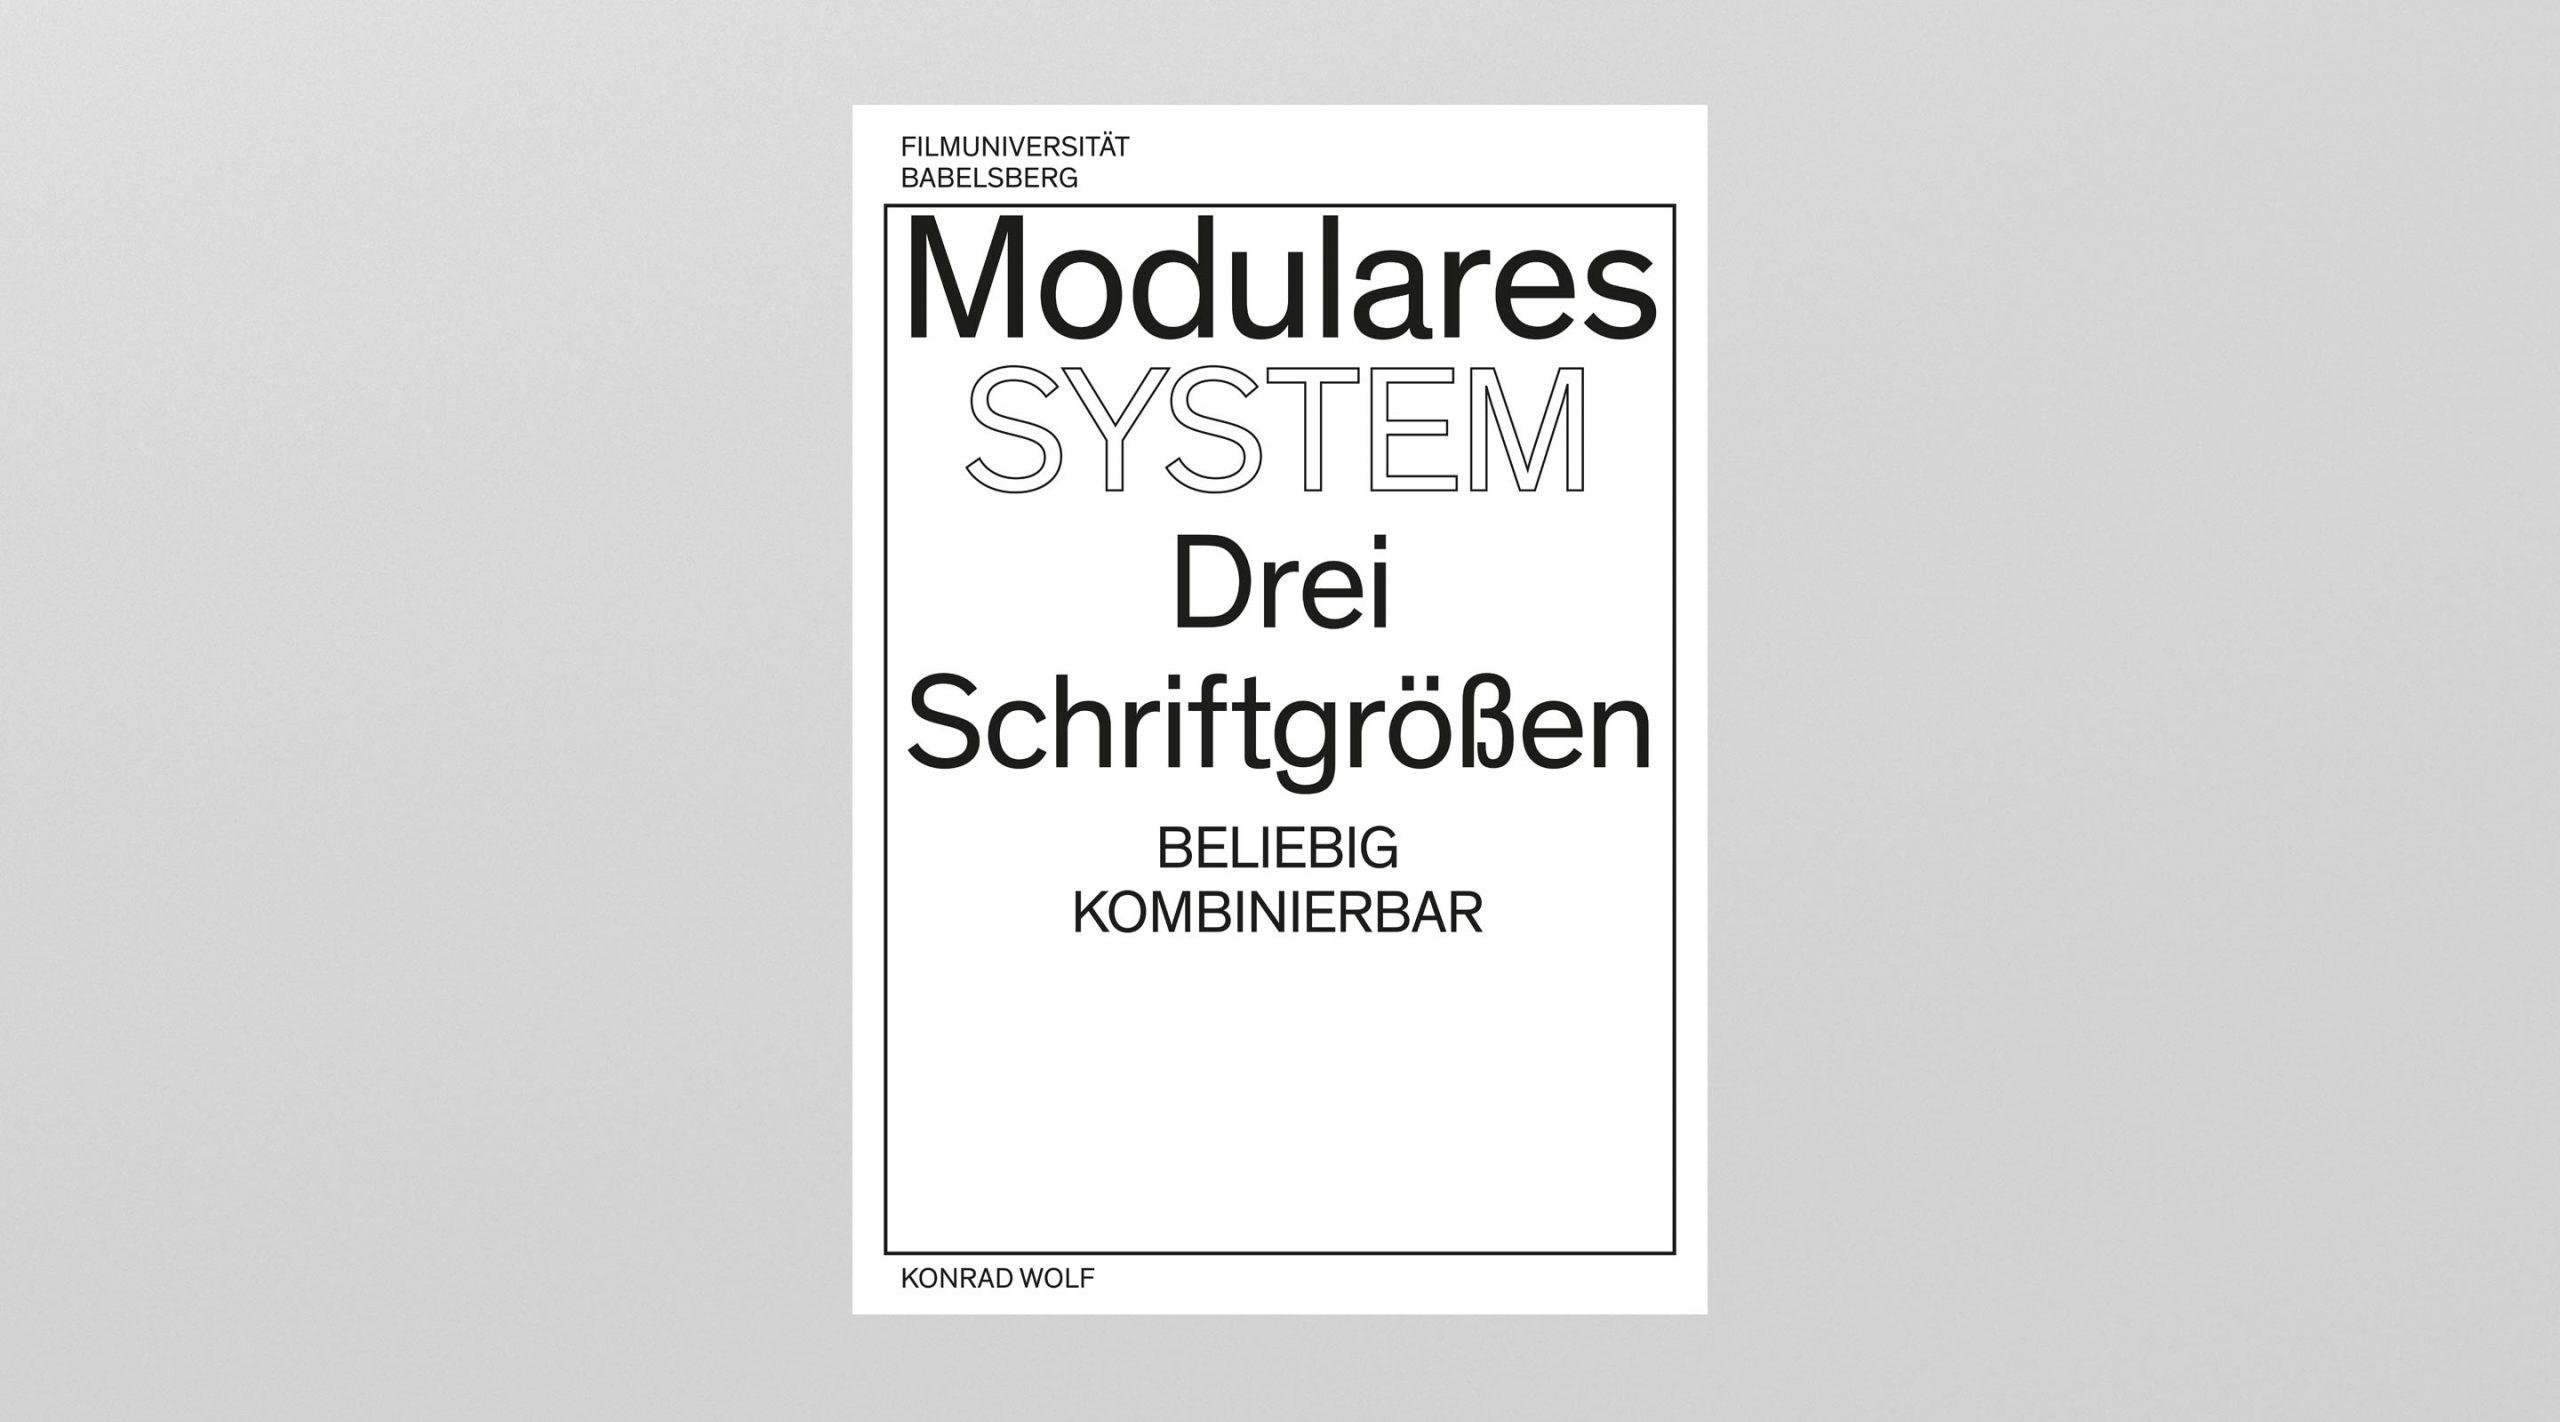 Filmuniversität Branding Proposal Plakatkonzept das modulare System – Uthmöller und Partner